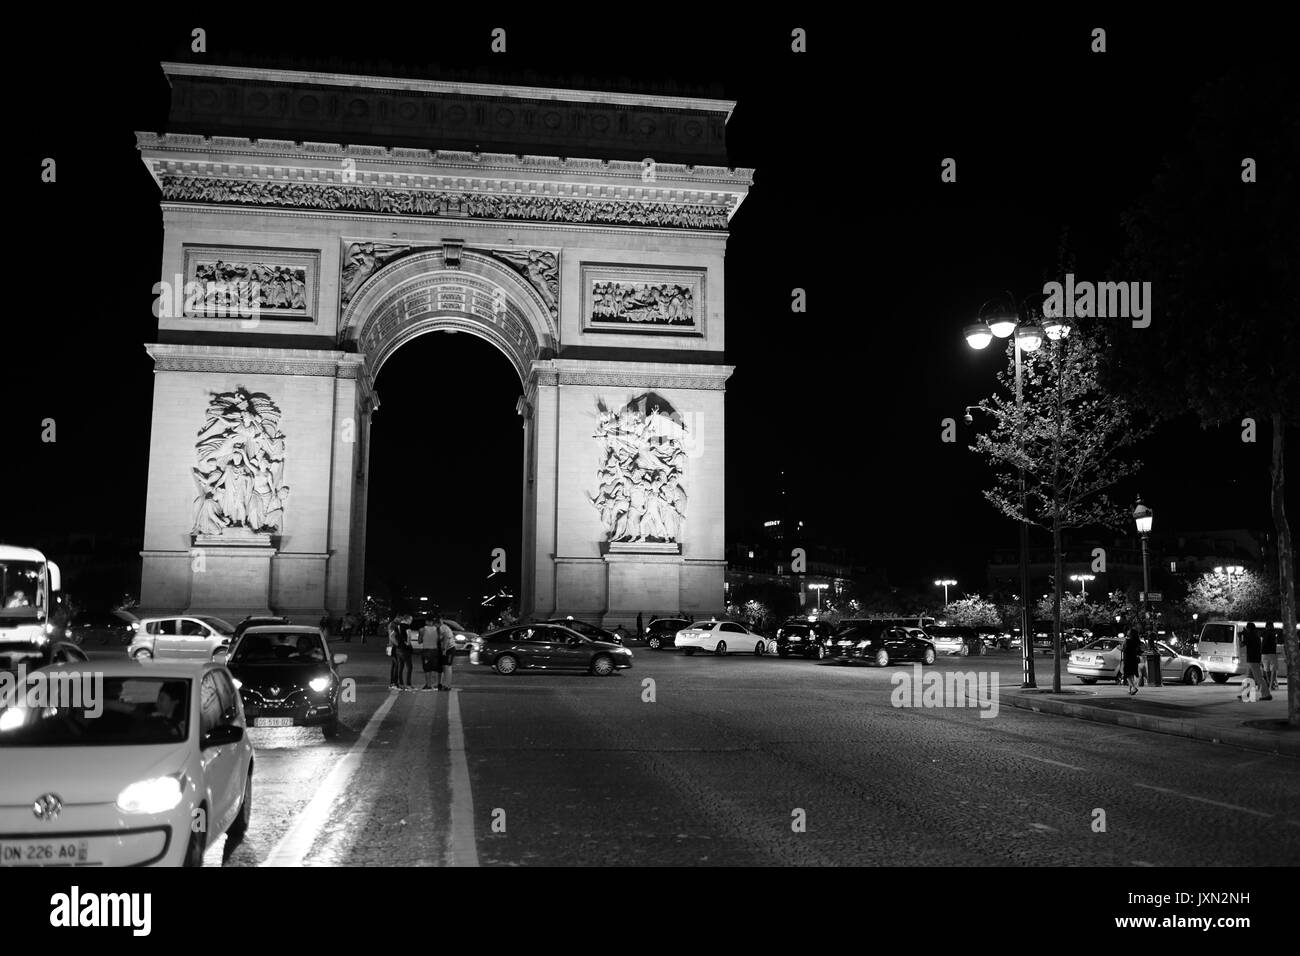 A shot taken at night of The Arc de Triomphe de l'Étoile, one of the most famous monuments in Paris, at the end of the Champs-Élysées - Stock Image